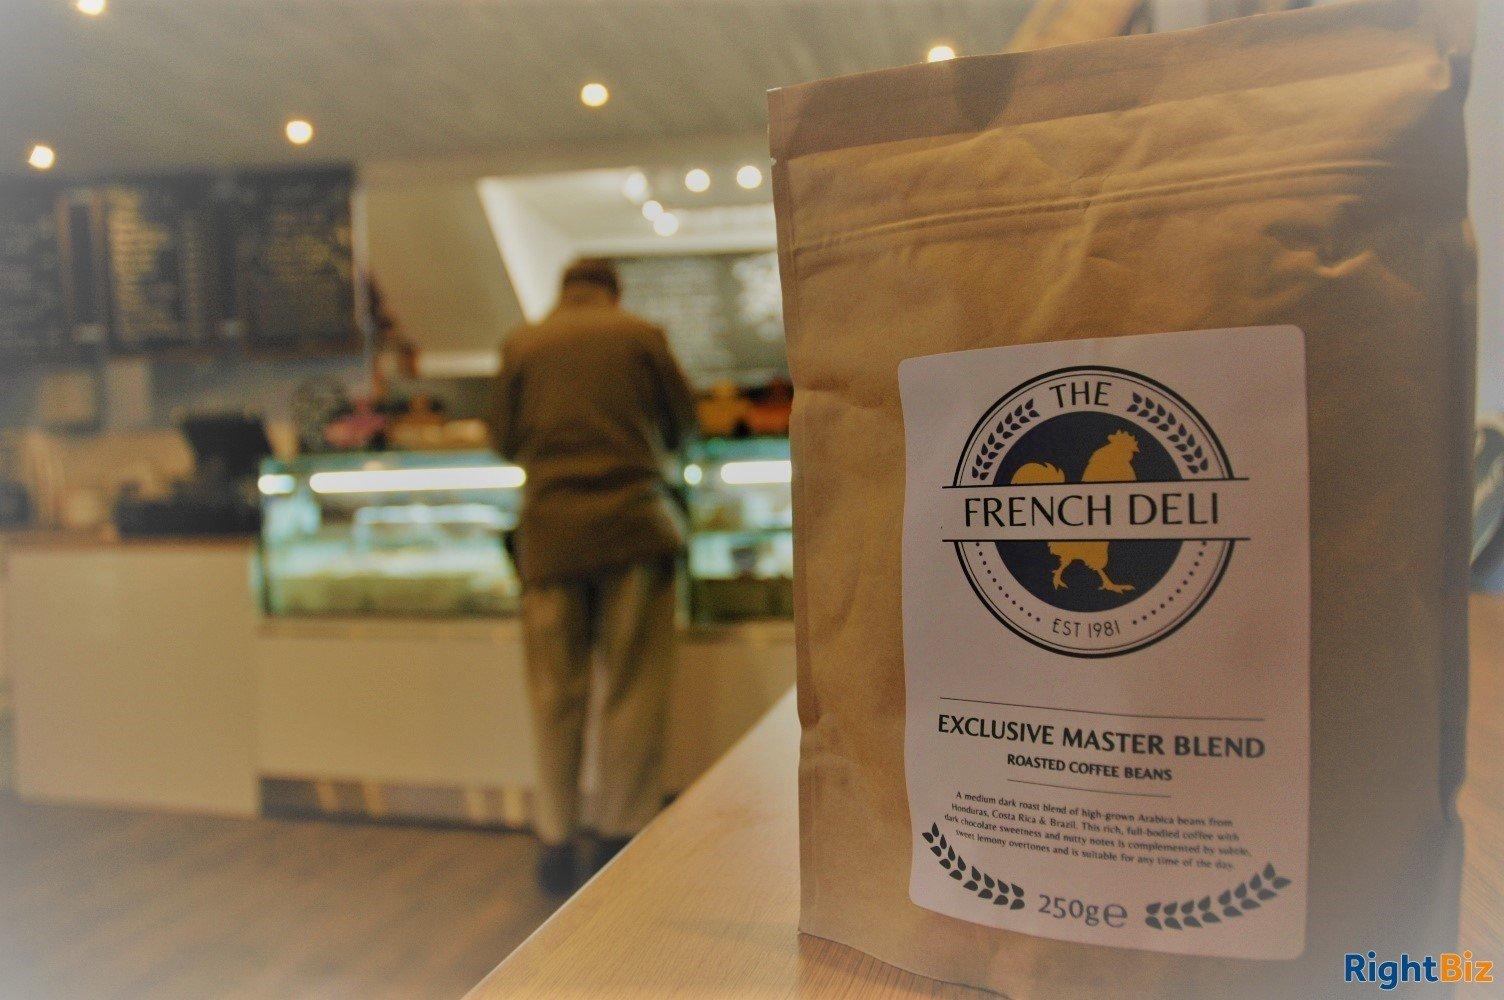 Premium Sandwich Shop and Delicatessen in Stourbridge, West Midlands *Offers Invited* - Image 5